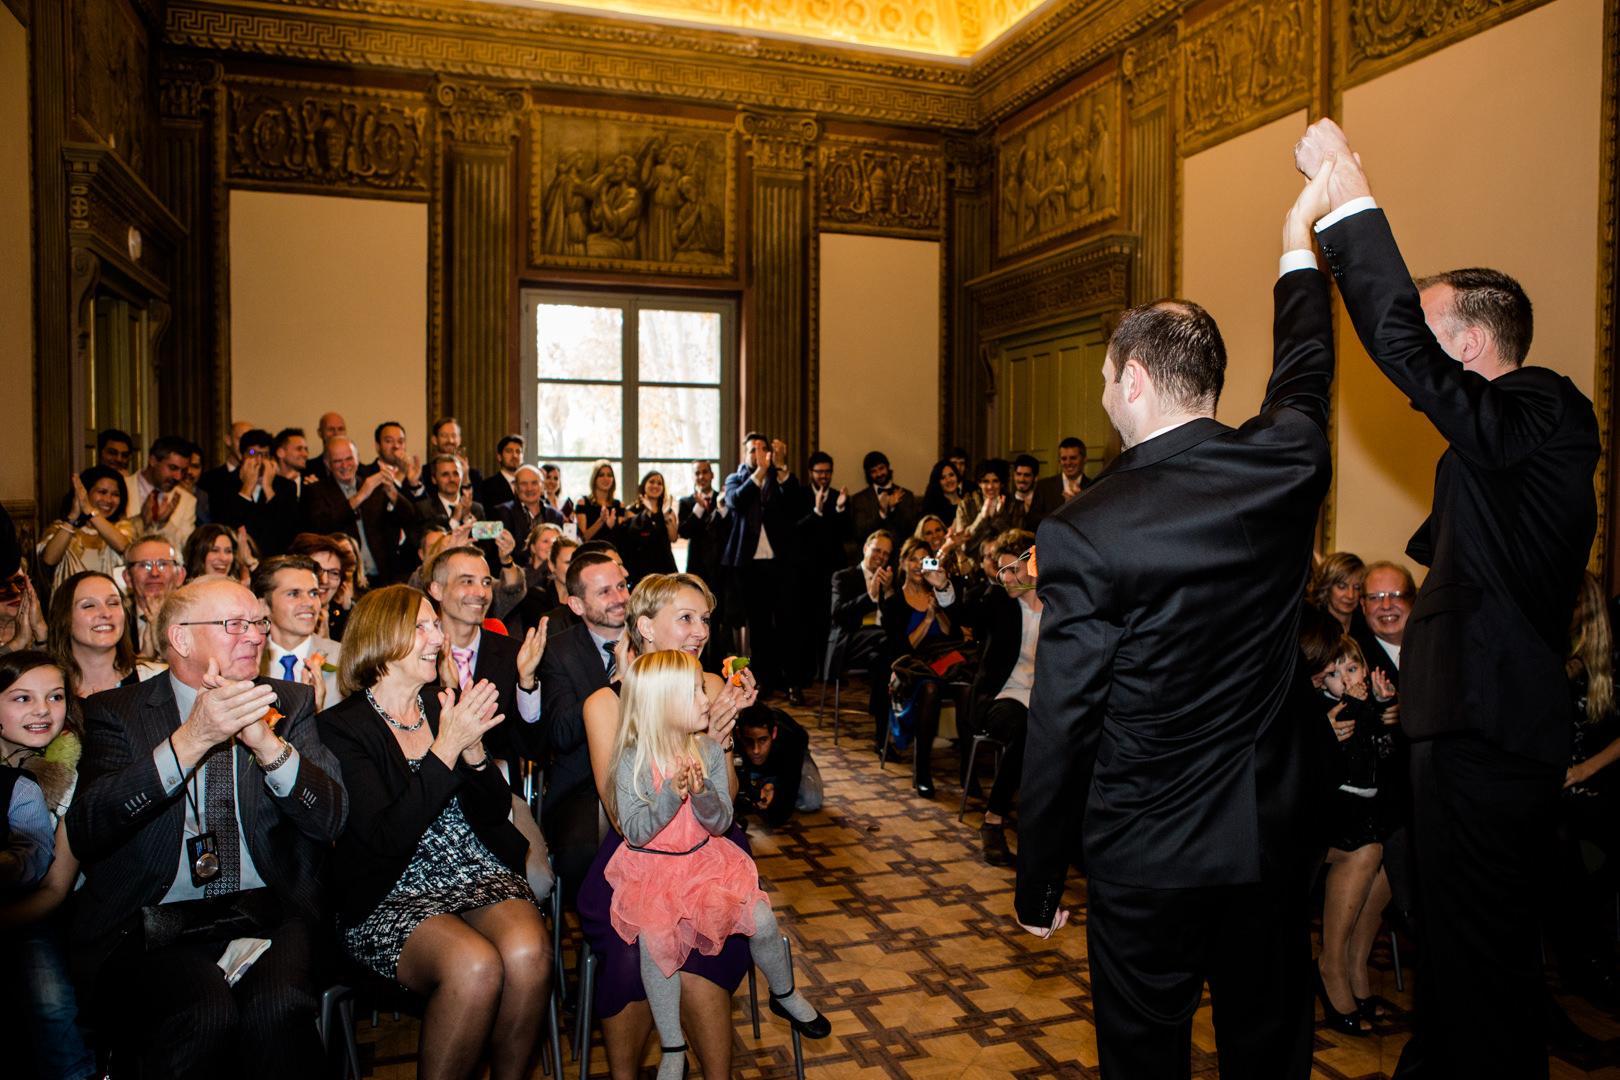 Same-sex-wedding-barcelona-boda- gay-samesex-engagement-Rafael-Torres-fotografo-bodas-sevilla-madrid-barcelona-wedding-photographer--16.jpg